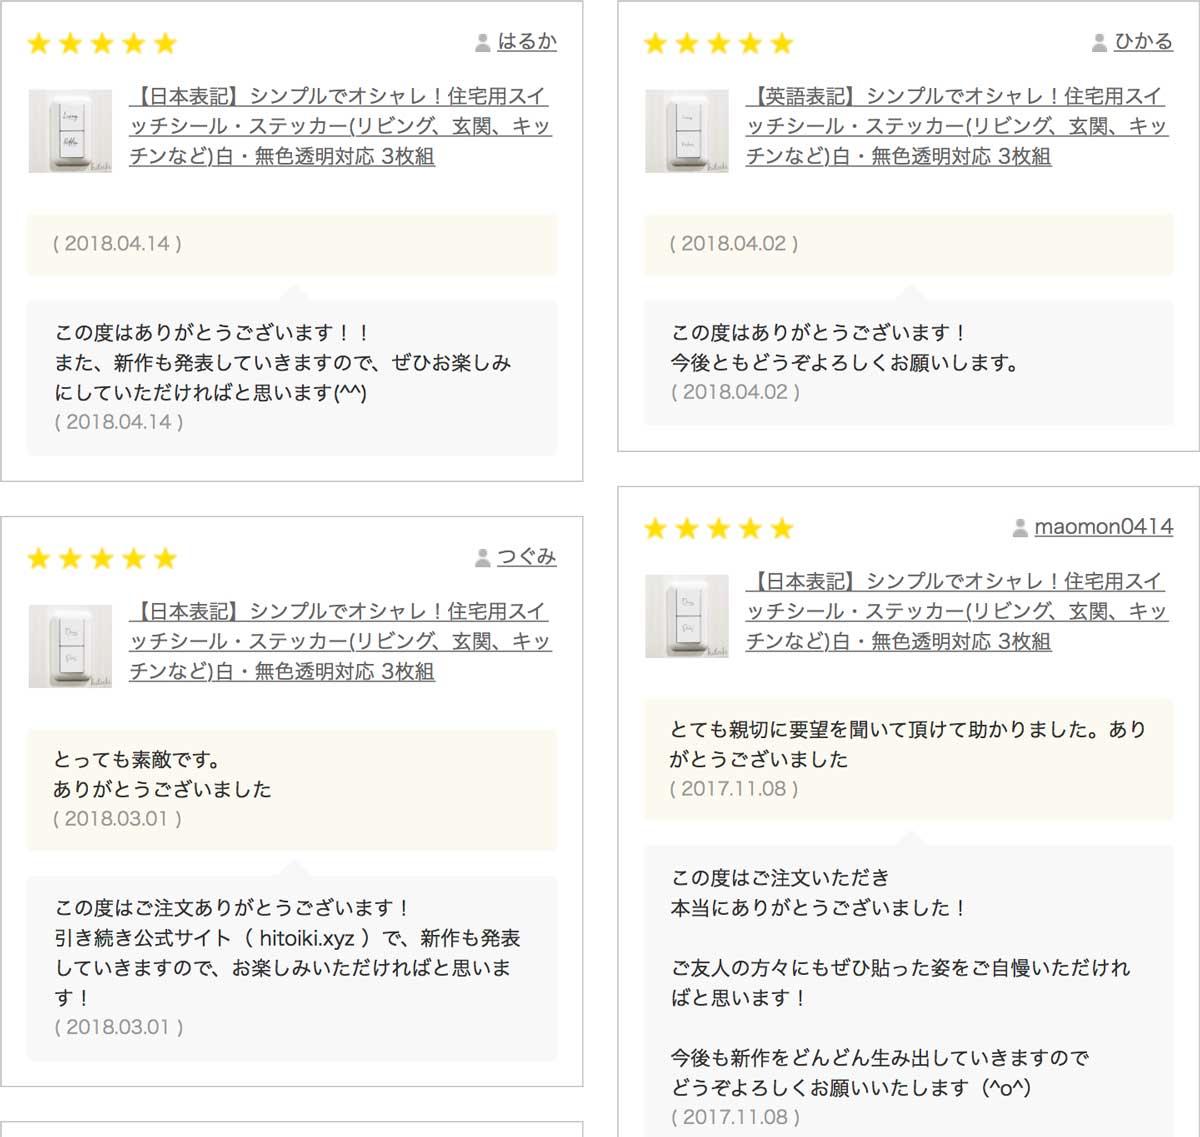 hitoiki ONLINESHOP(ひといきオンラインショップ)で実際に購入された方の評価や評判、レビュー、口コミ(クチコミ) review01